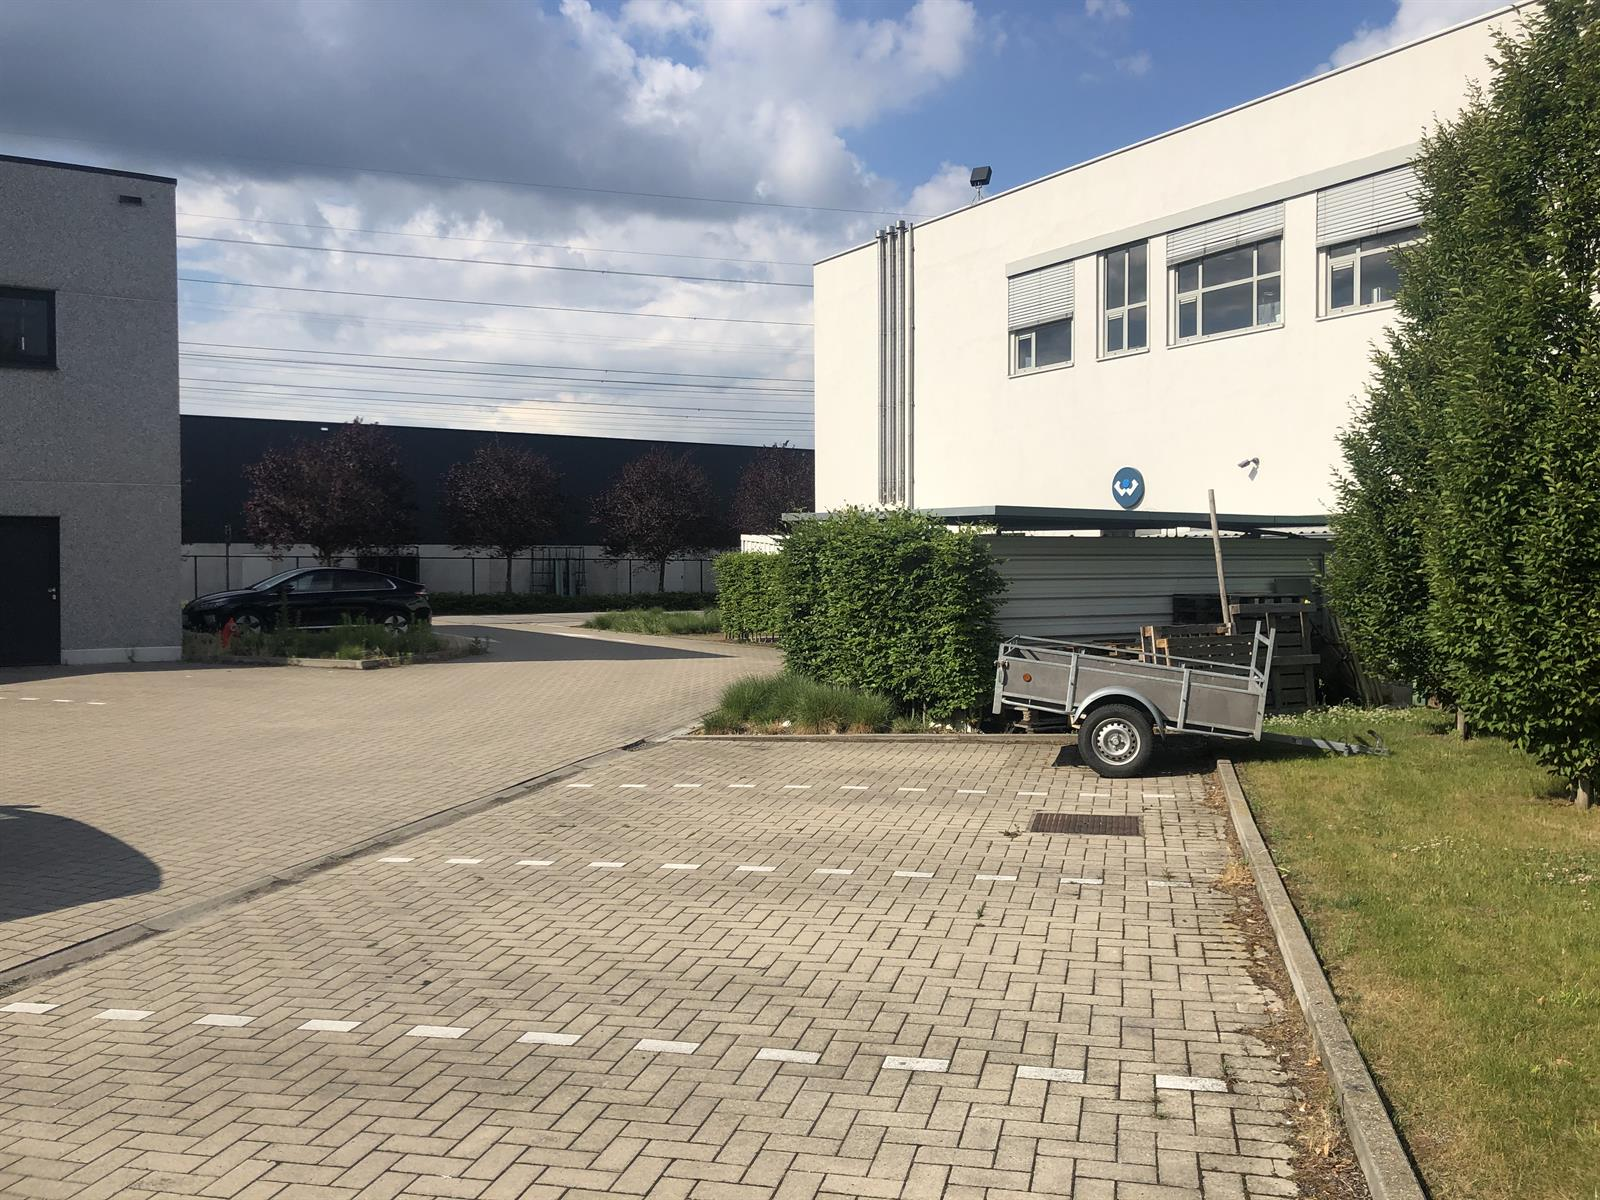 KMO-unit te koop I124 - KMO-Unit - Schoenstraat 11 K, 9140 Temse, België 17